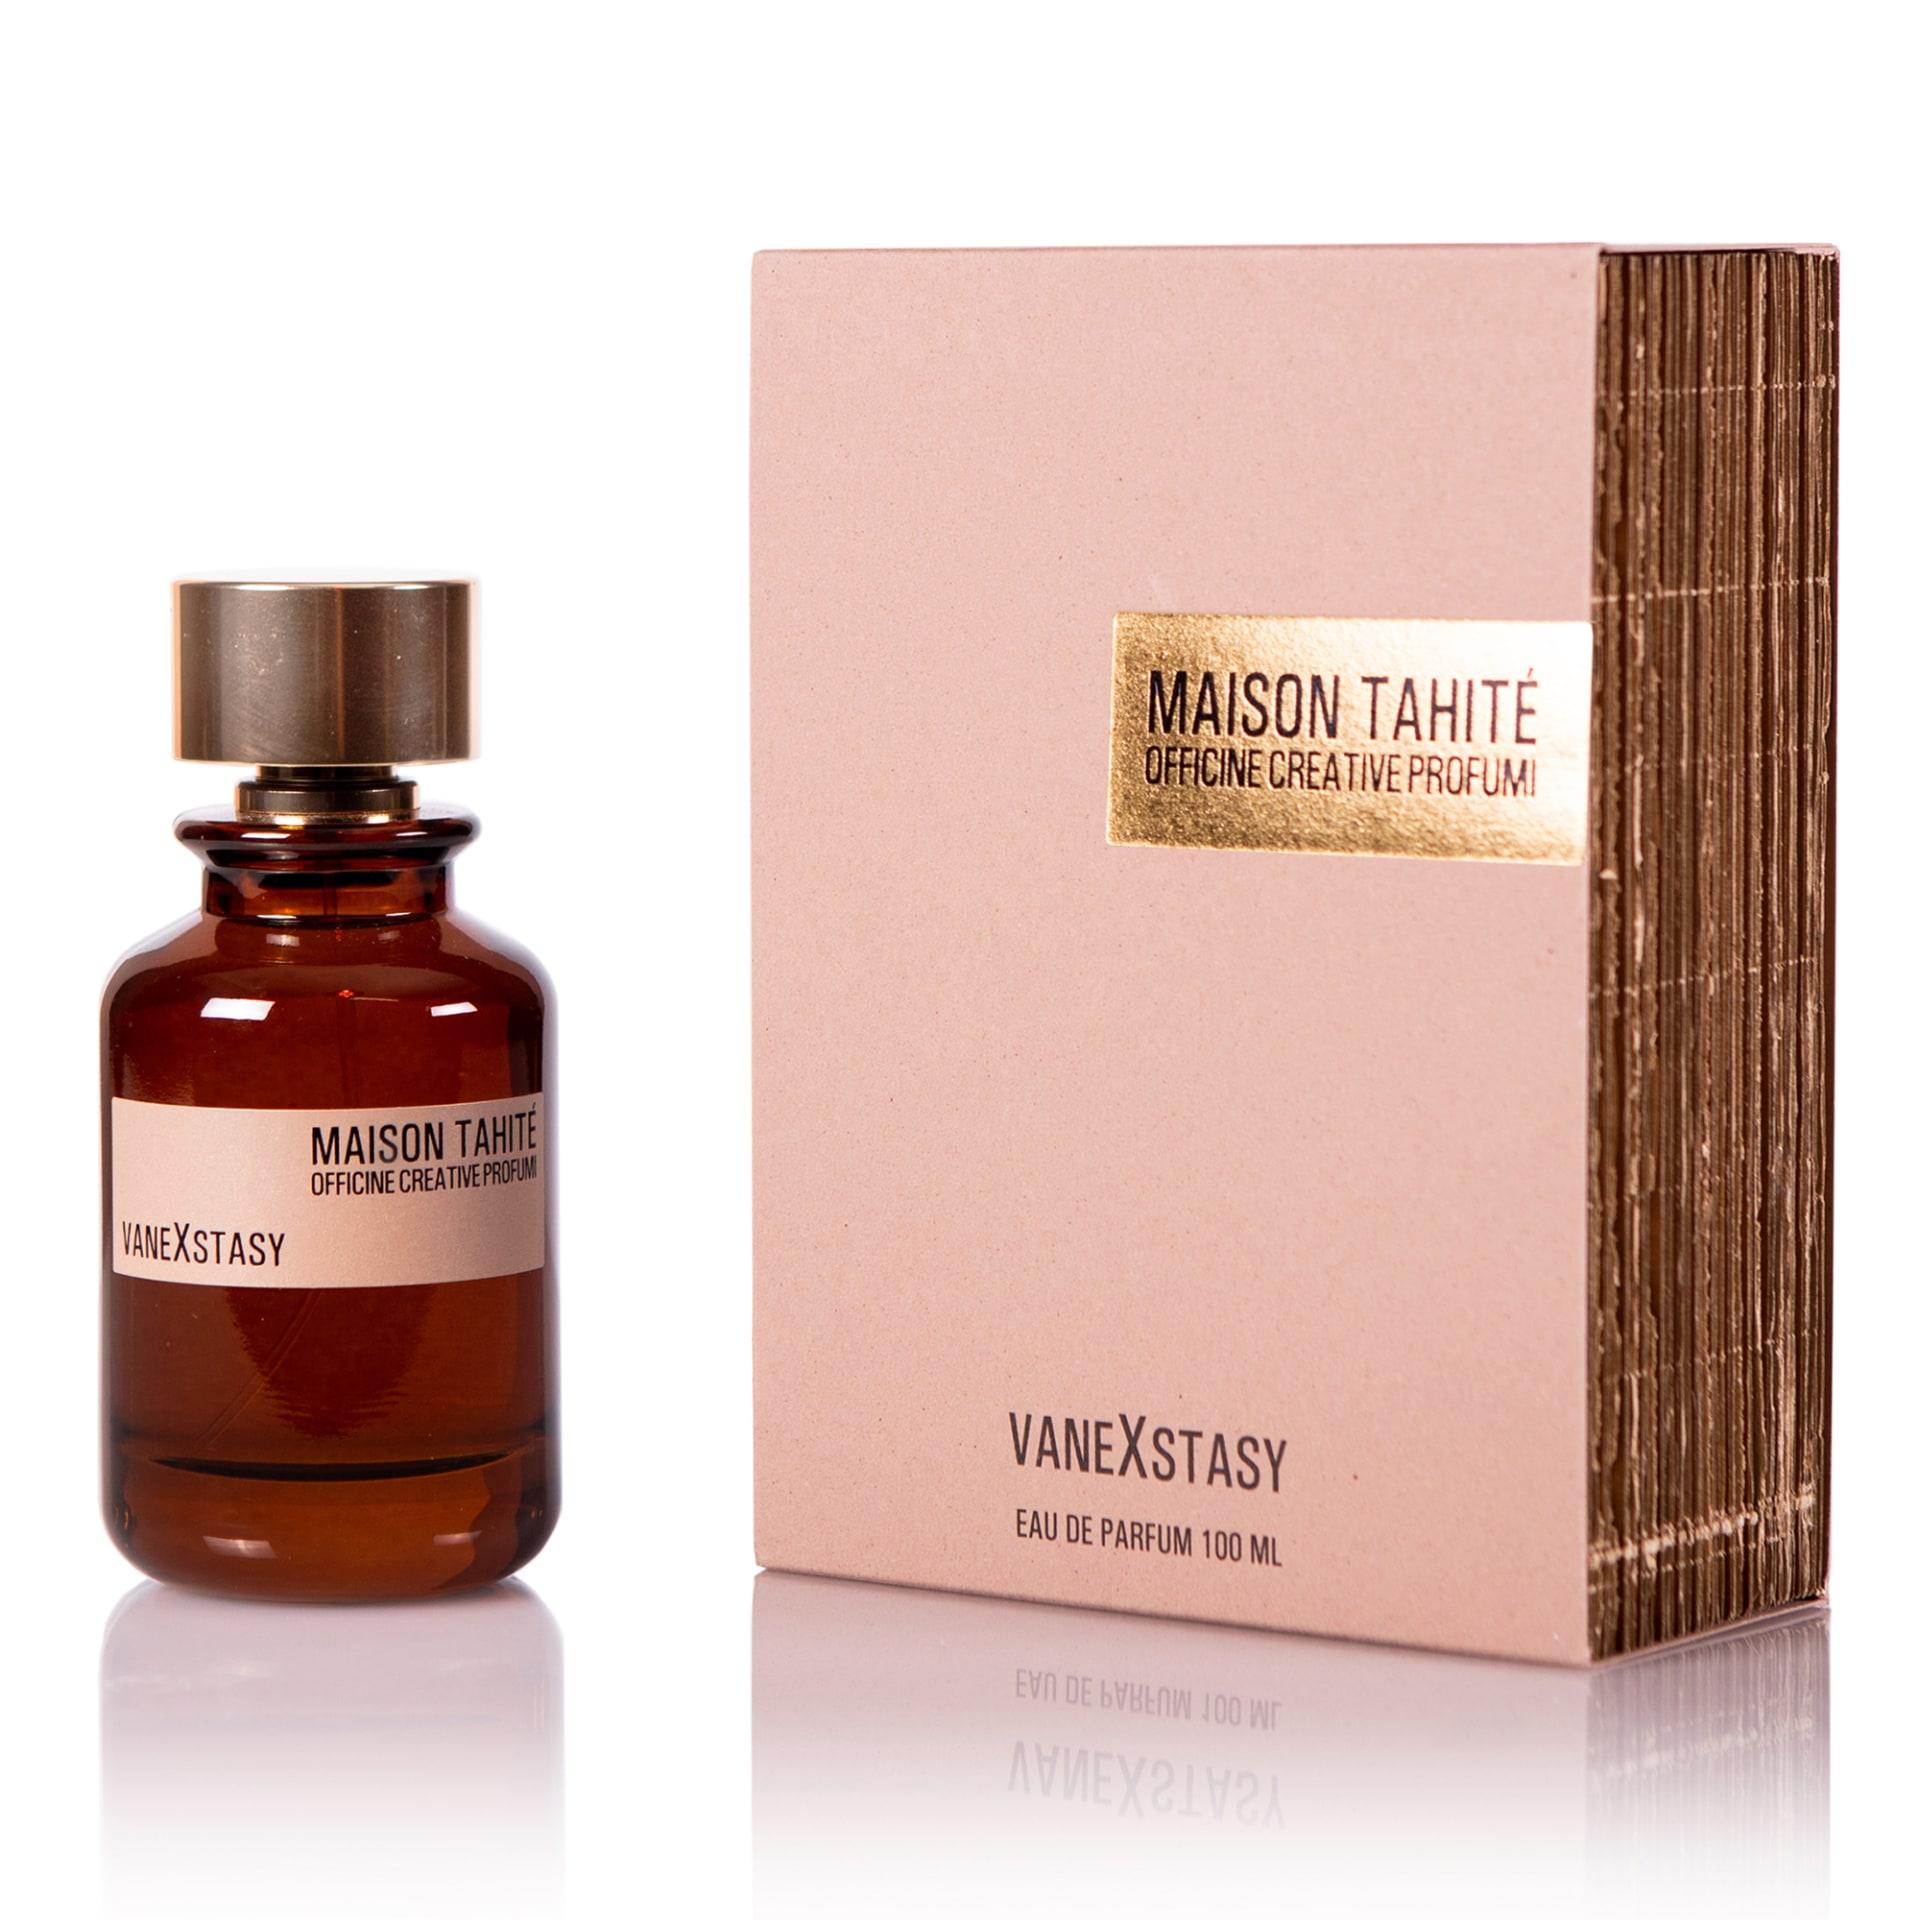 maison-tahite-vanextasy-2